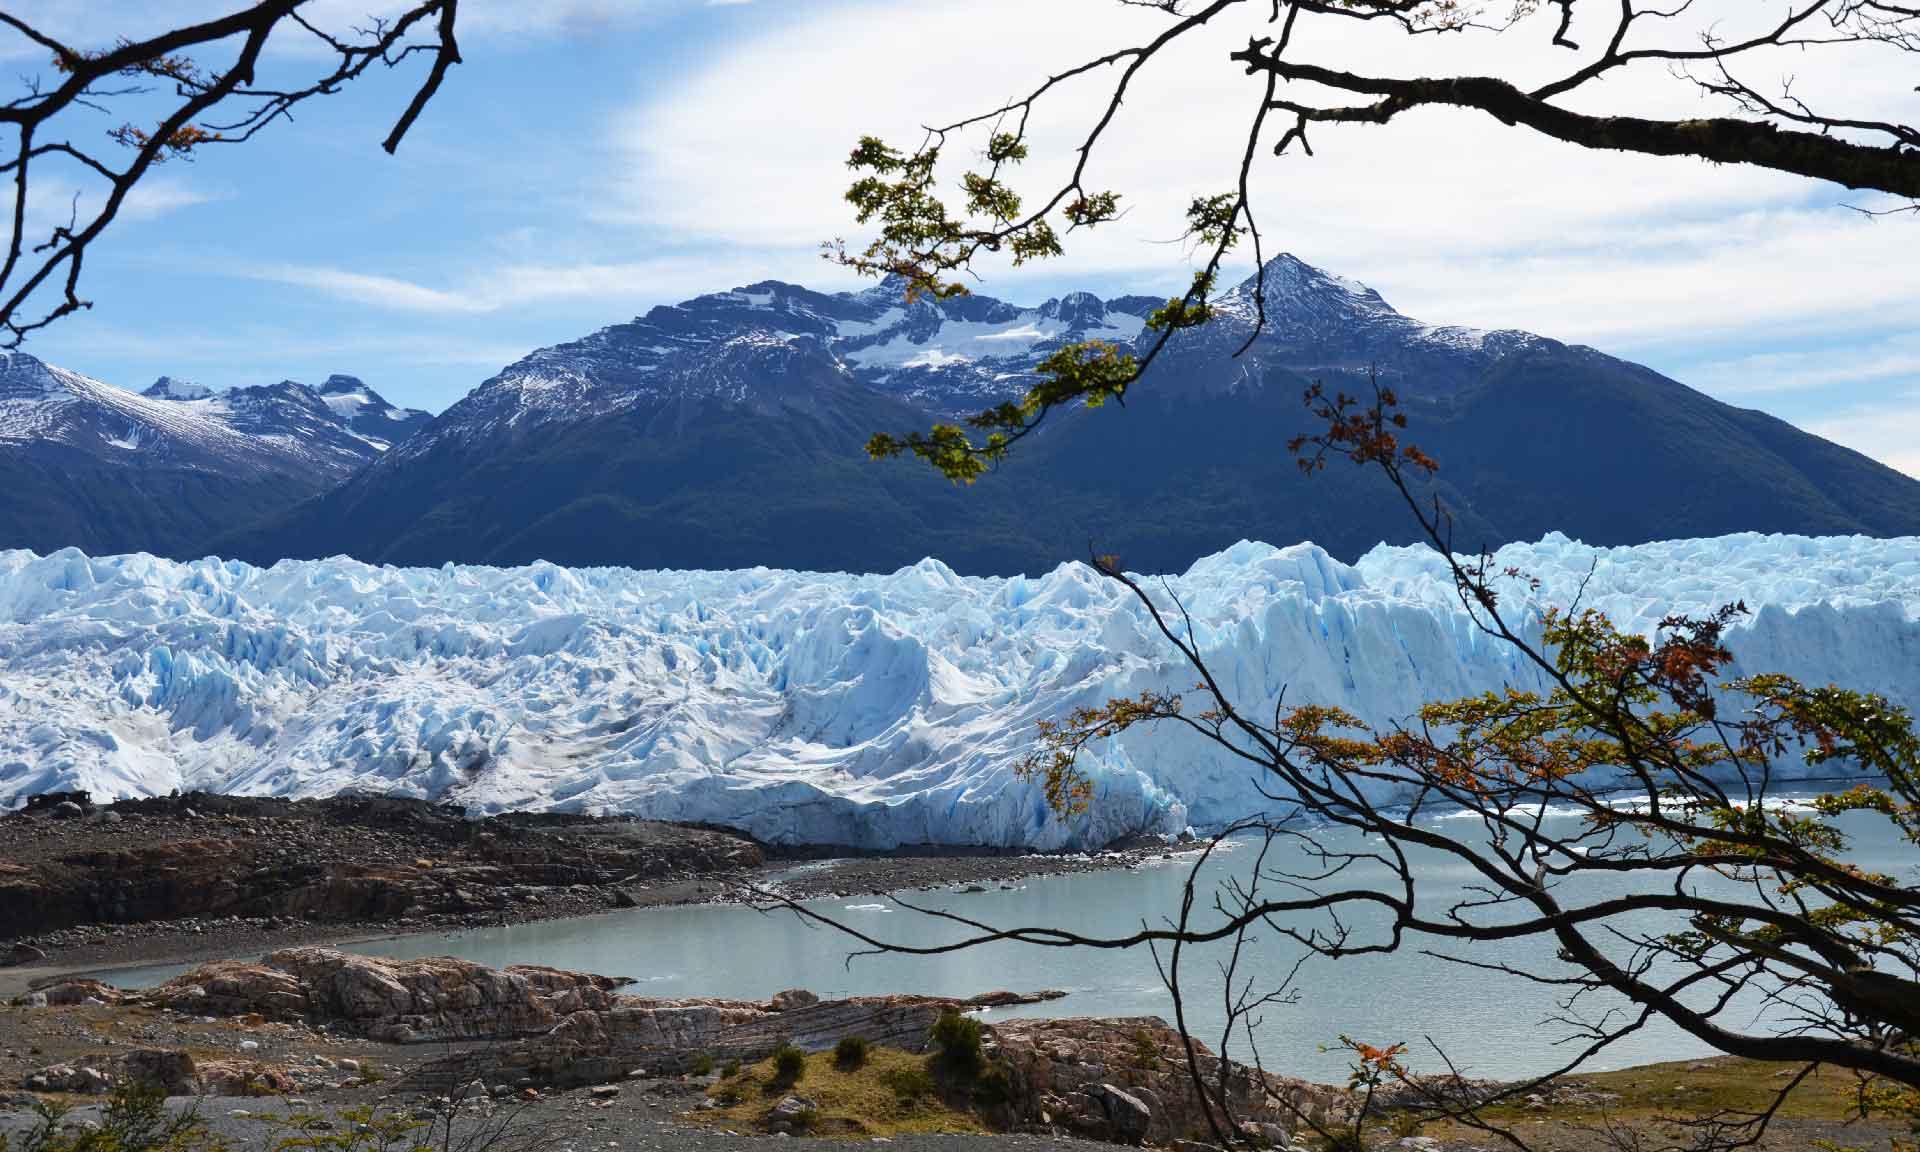 Argentine_Patagonie_Glacier-Perito-Moreno-c-Gaelle-Montcharmont-16-web